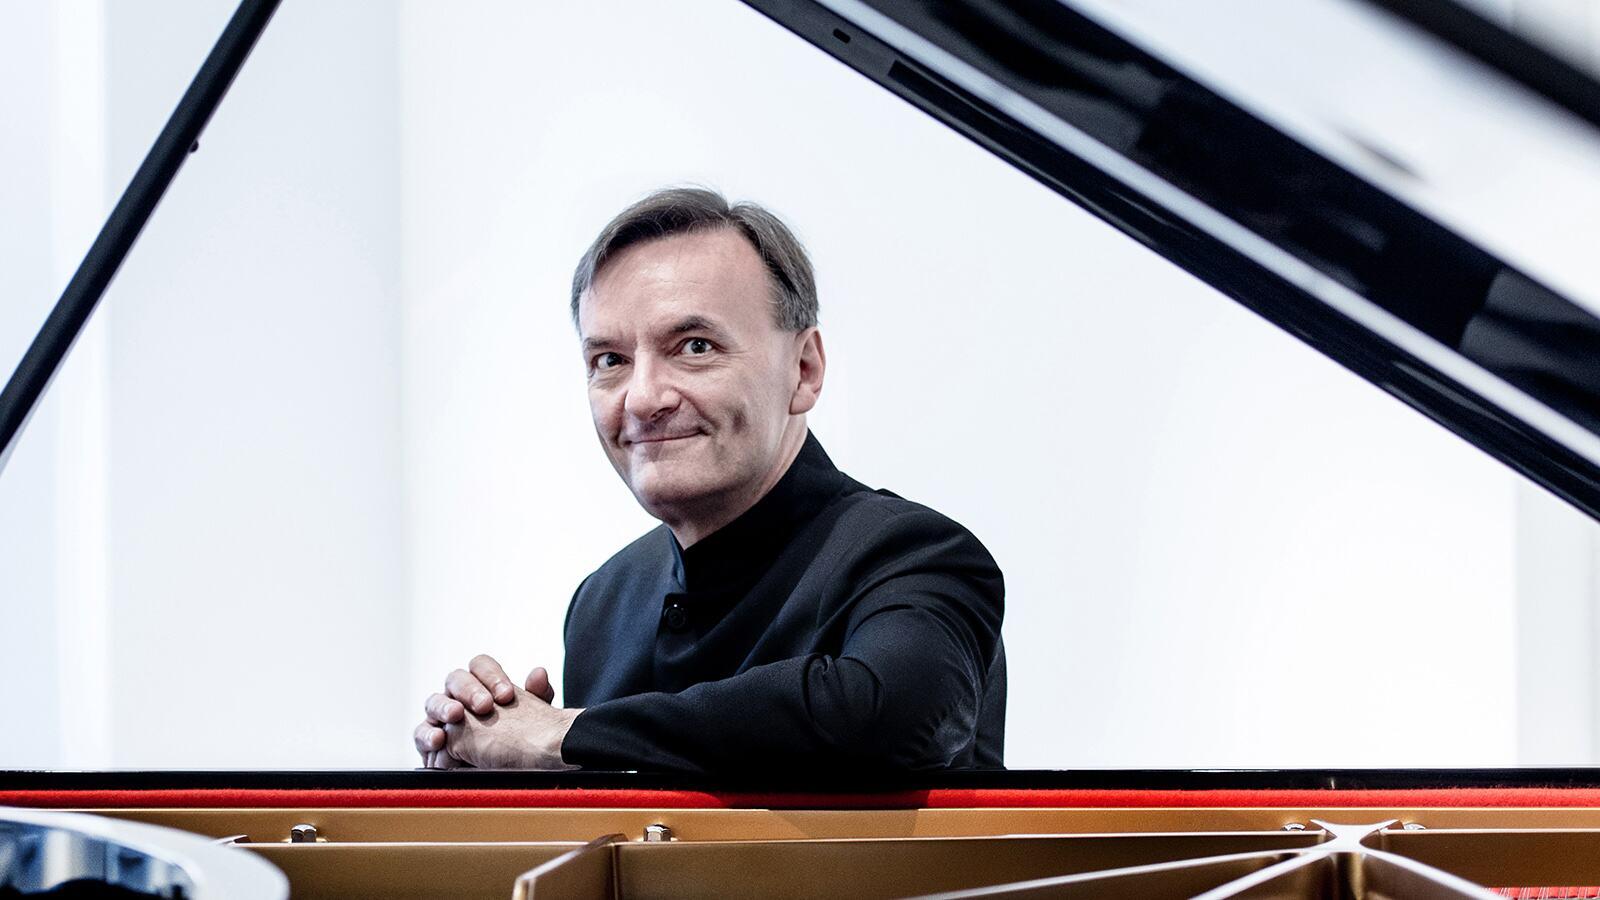 Stephen Hough, pianist